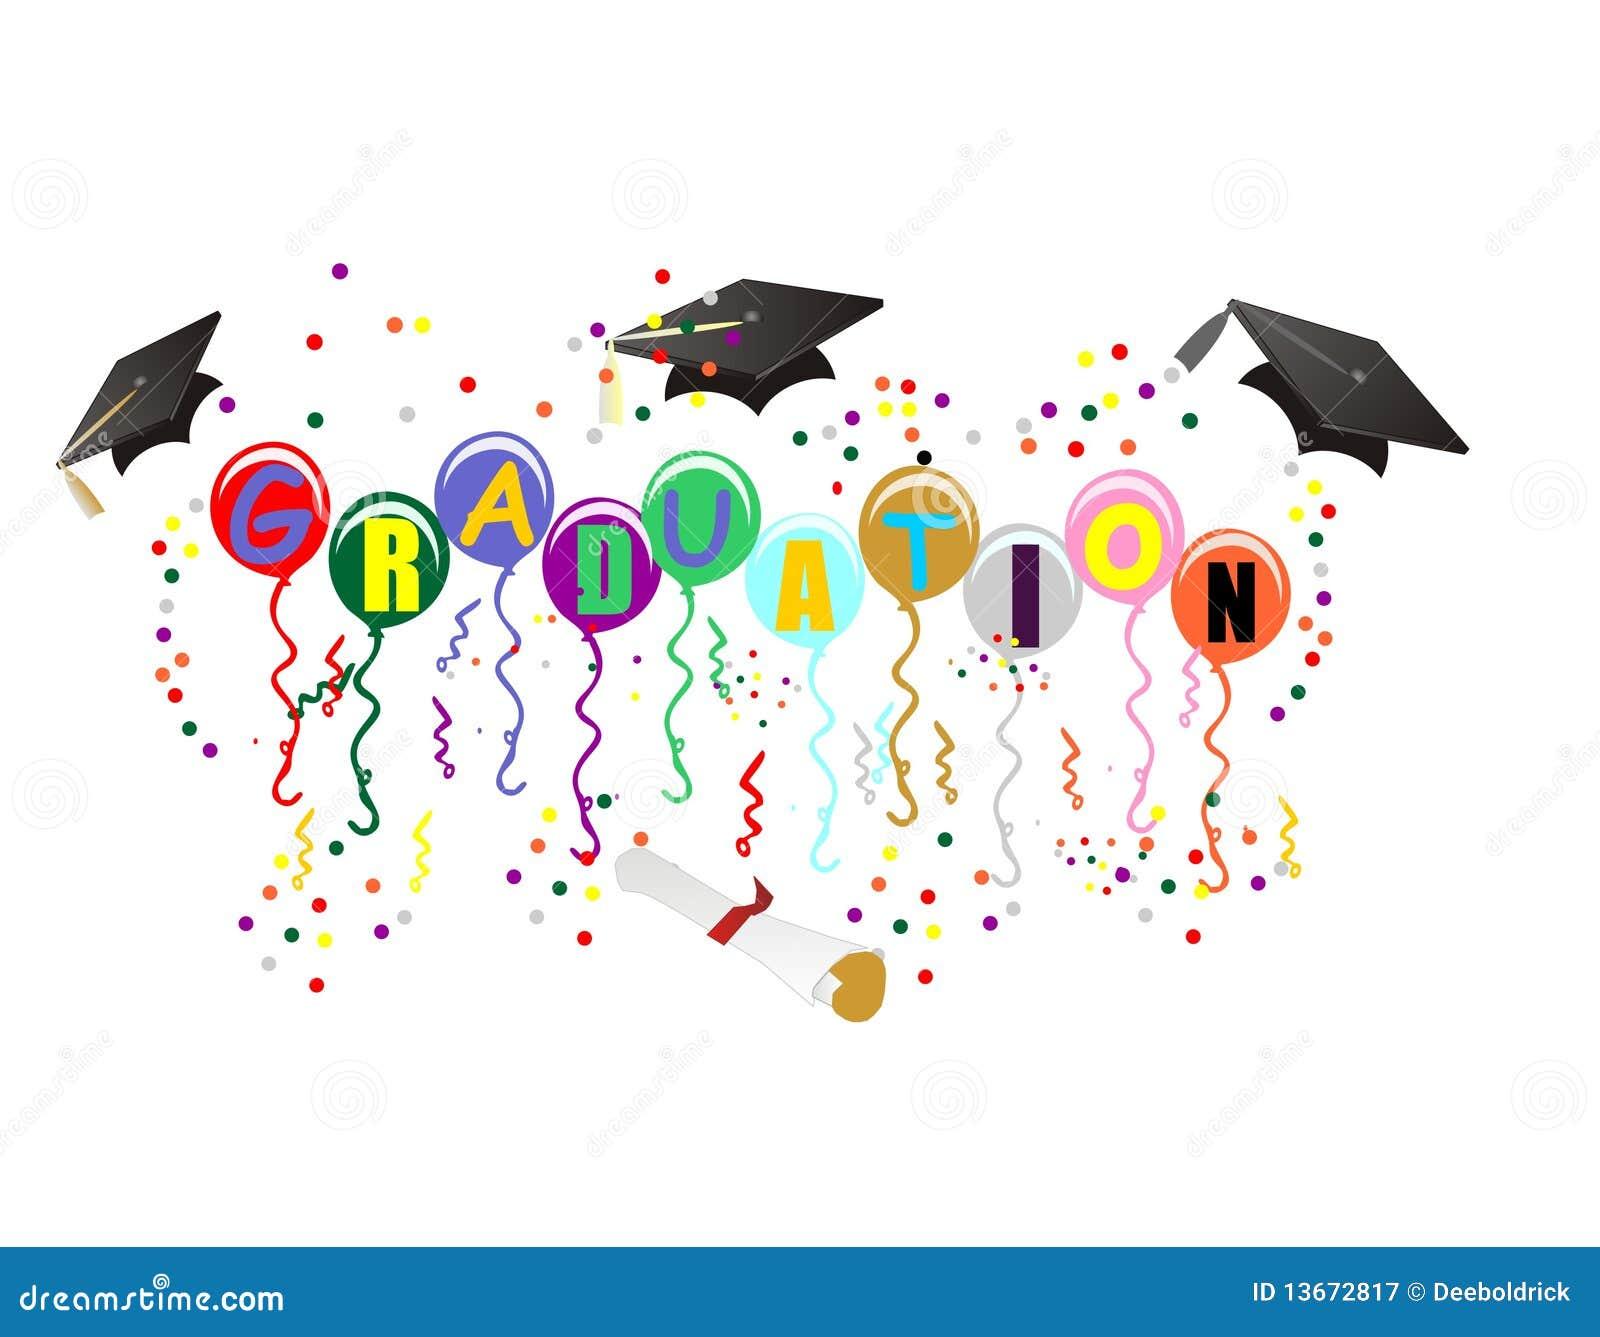 [Image: graduation-ballons-celebration-illustrat...672817.jpg]